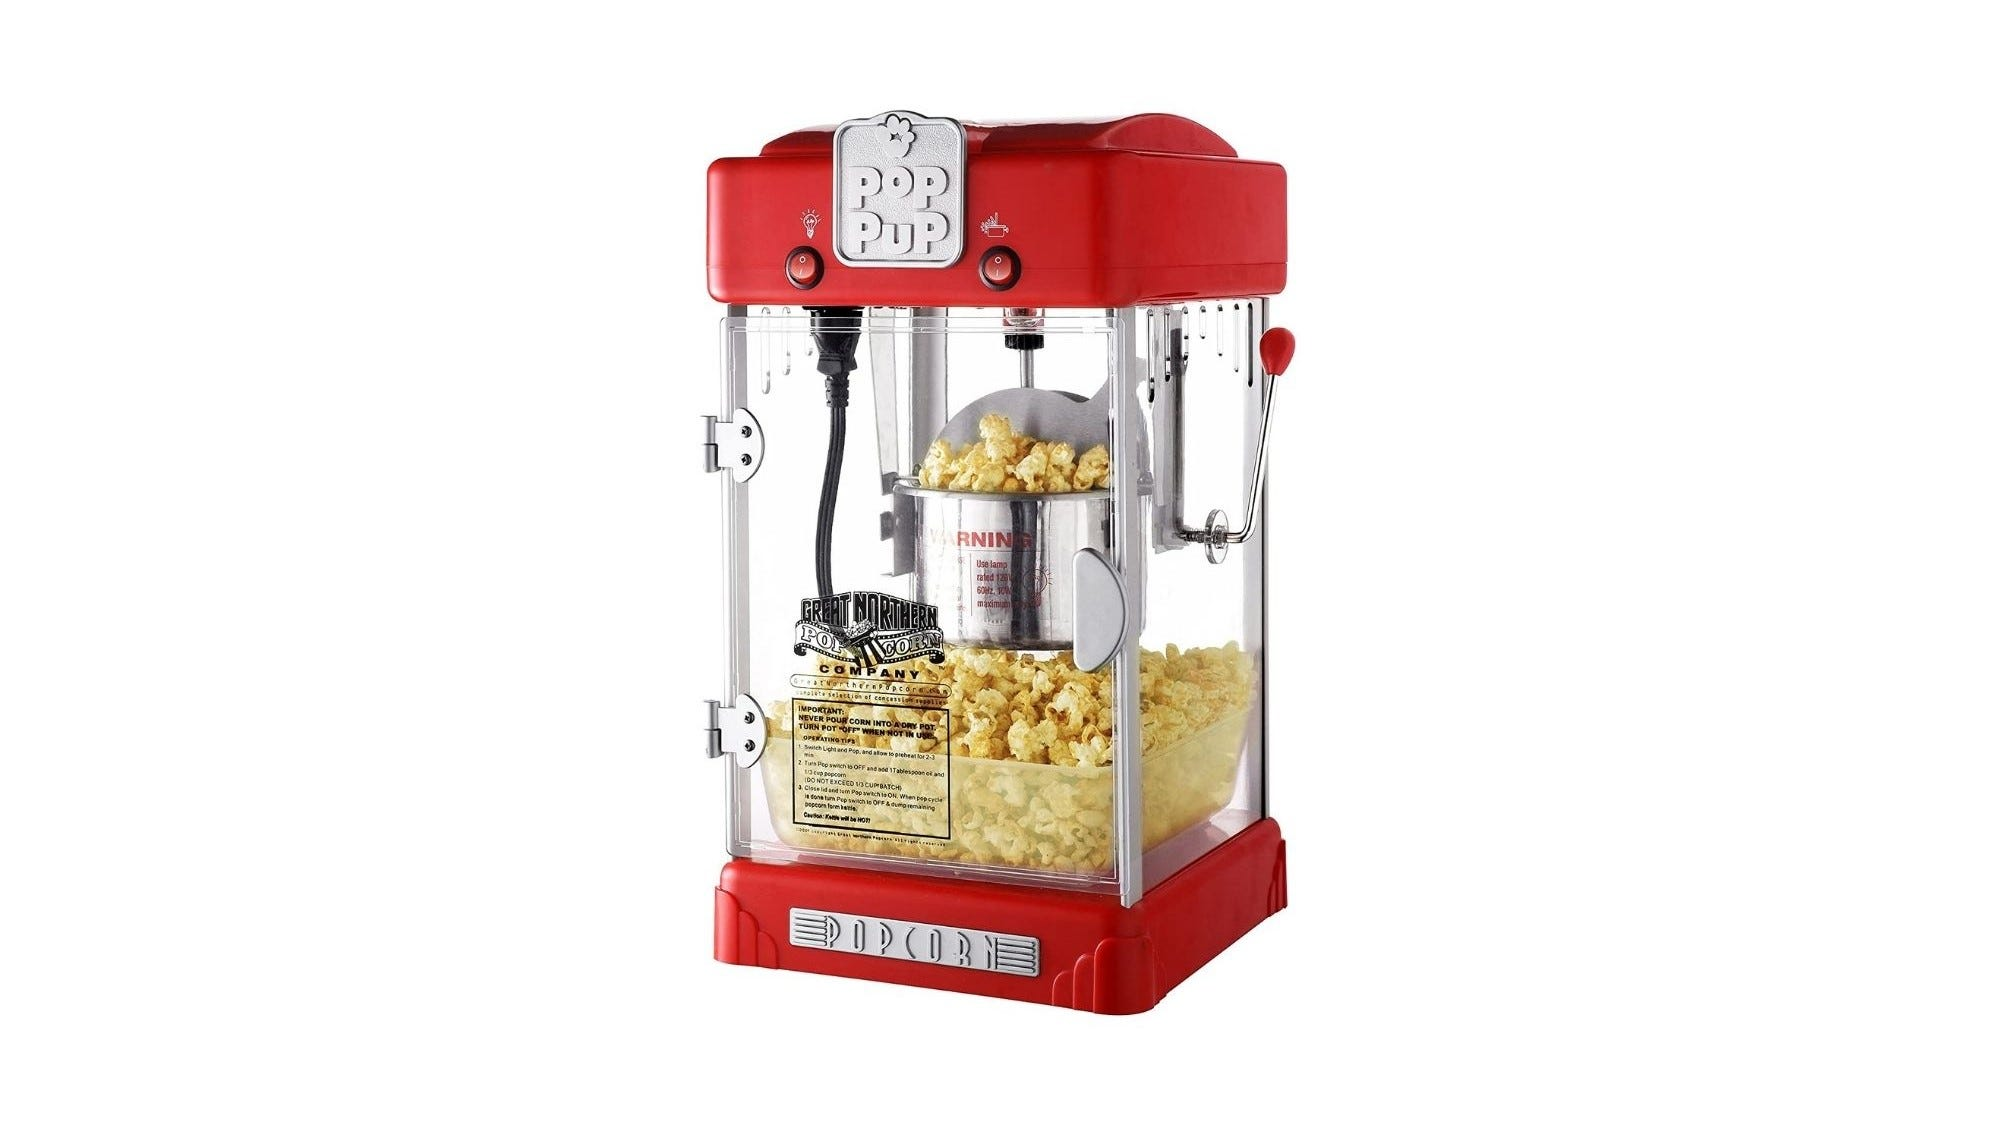 Theater-style popcorn maker.